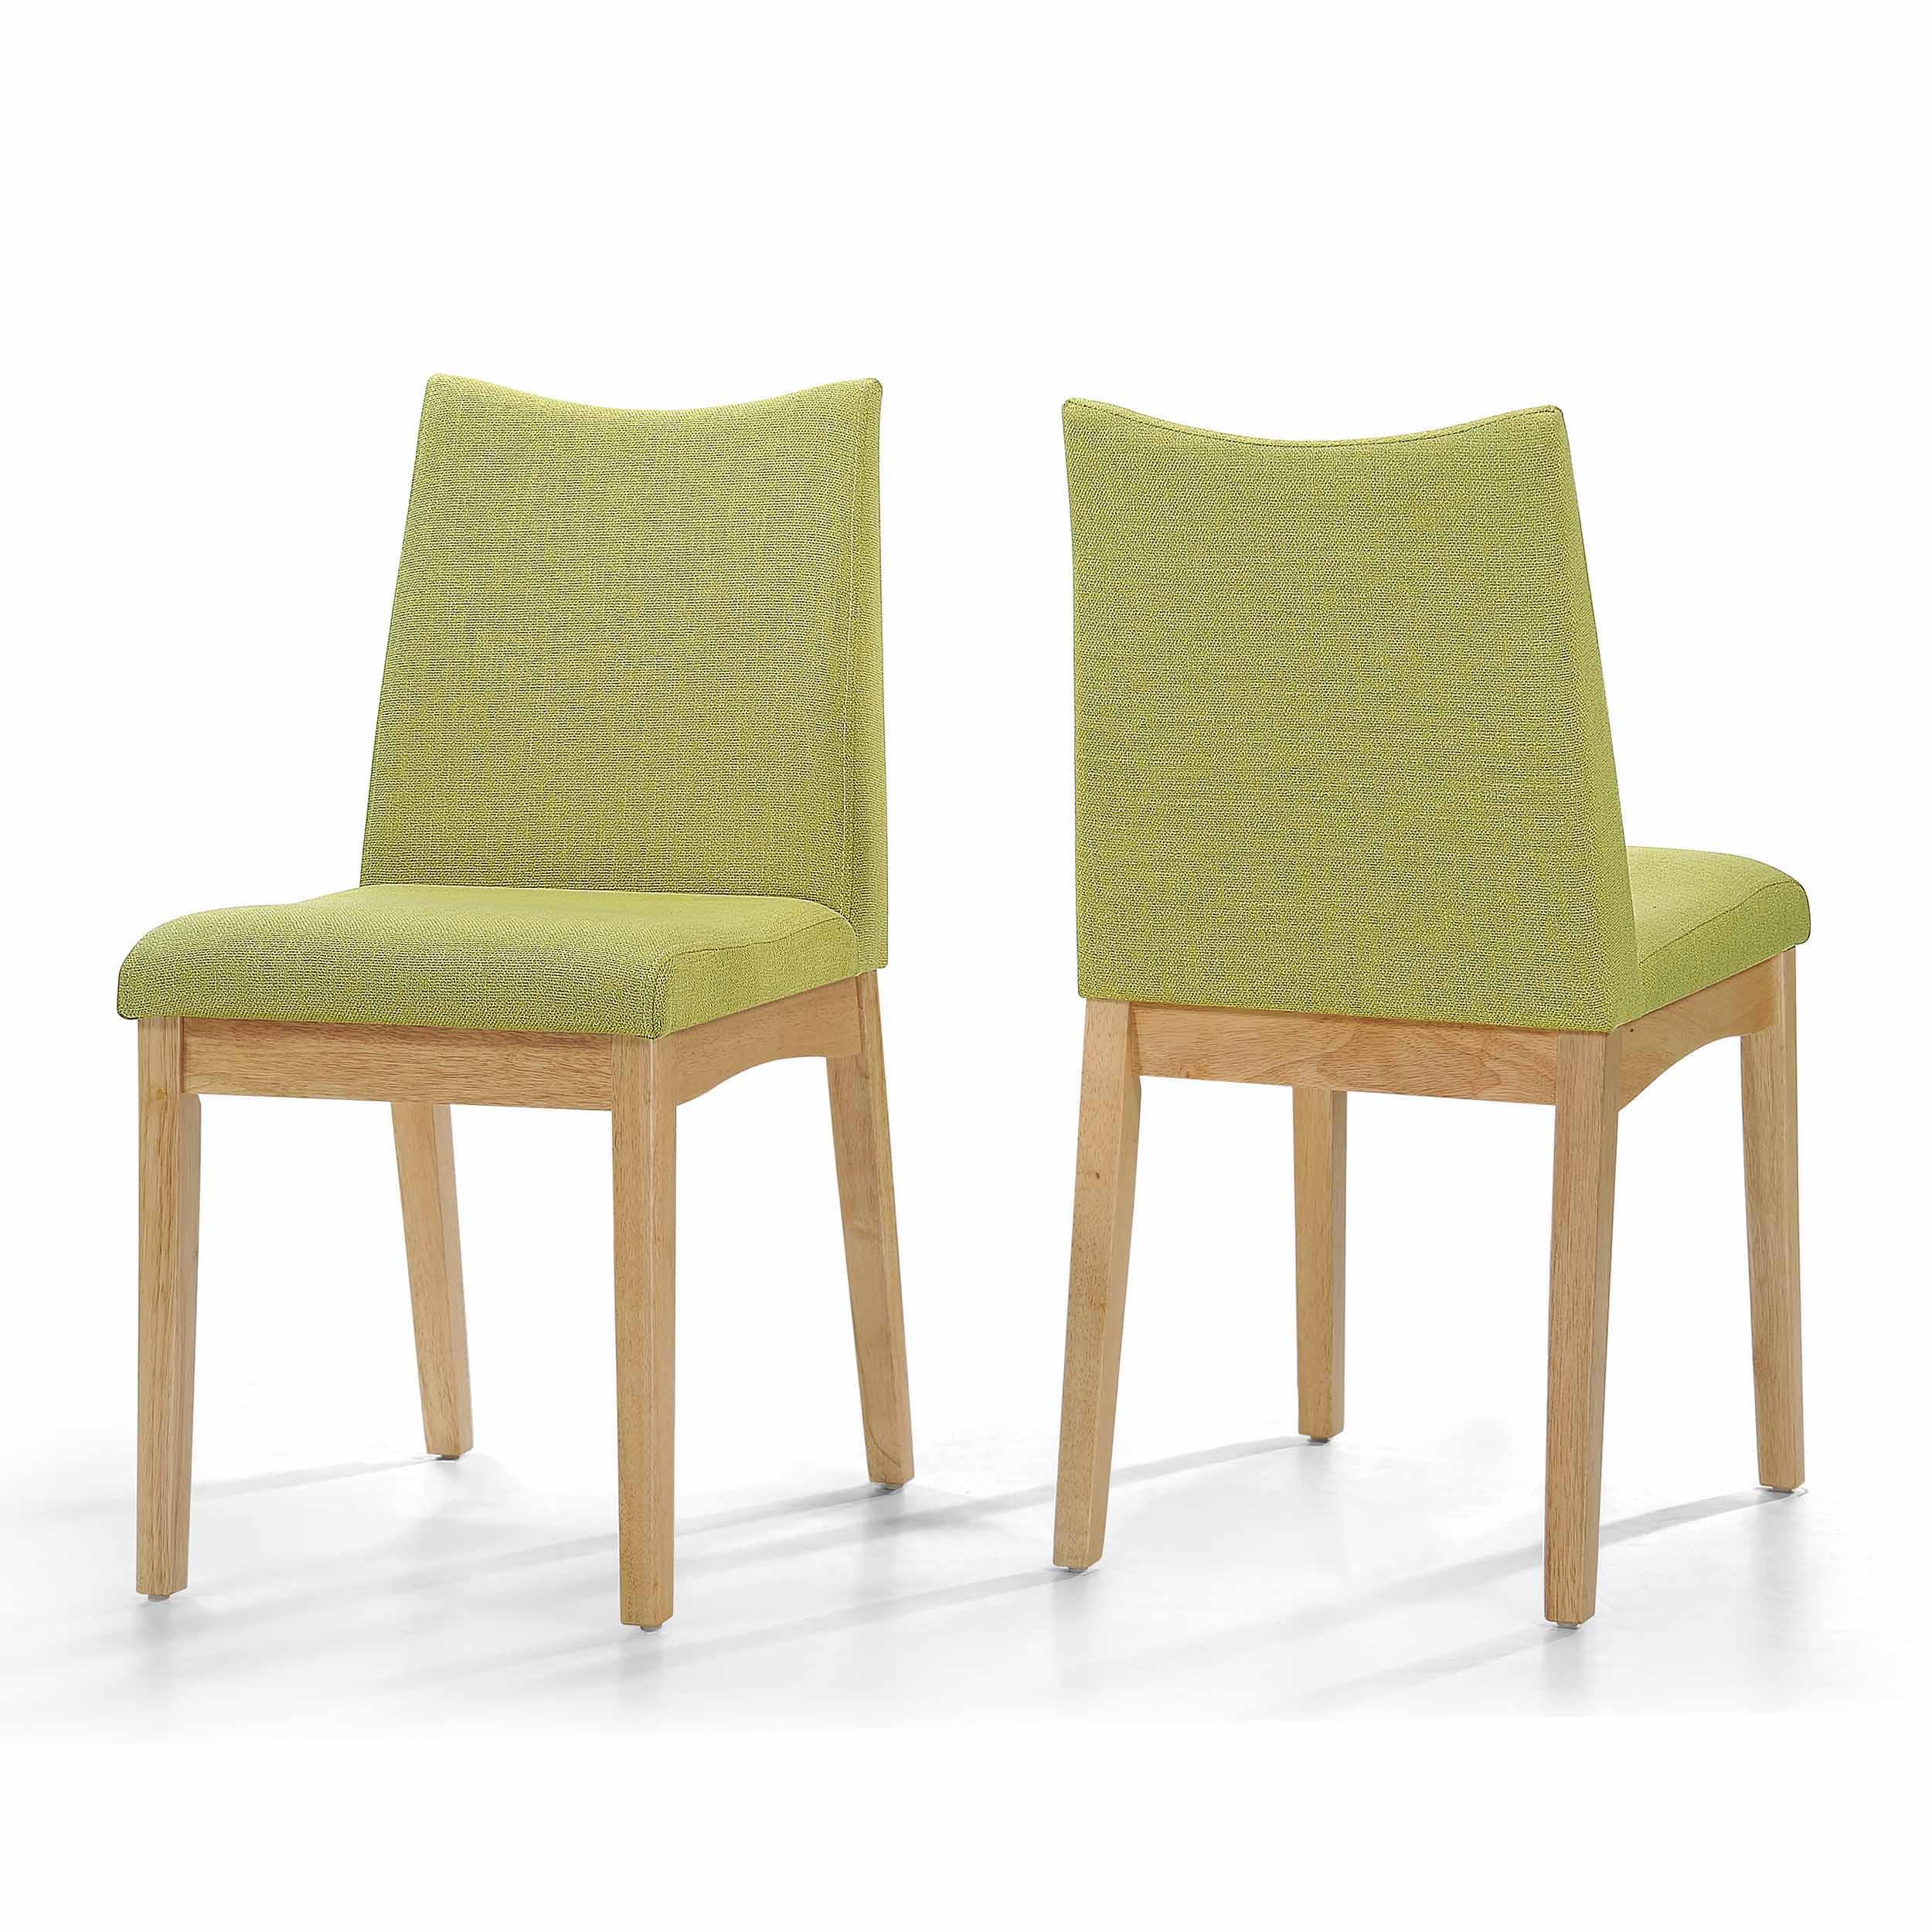 Oak Dining Chairs   Walmart.com